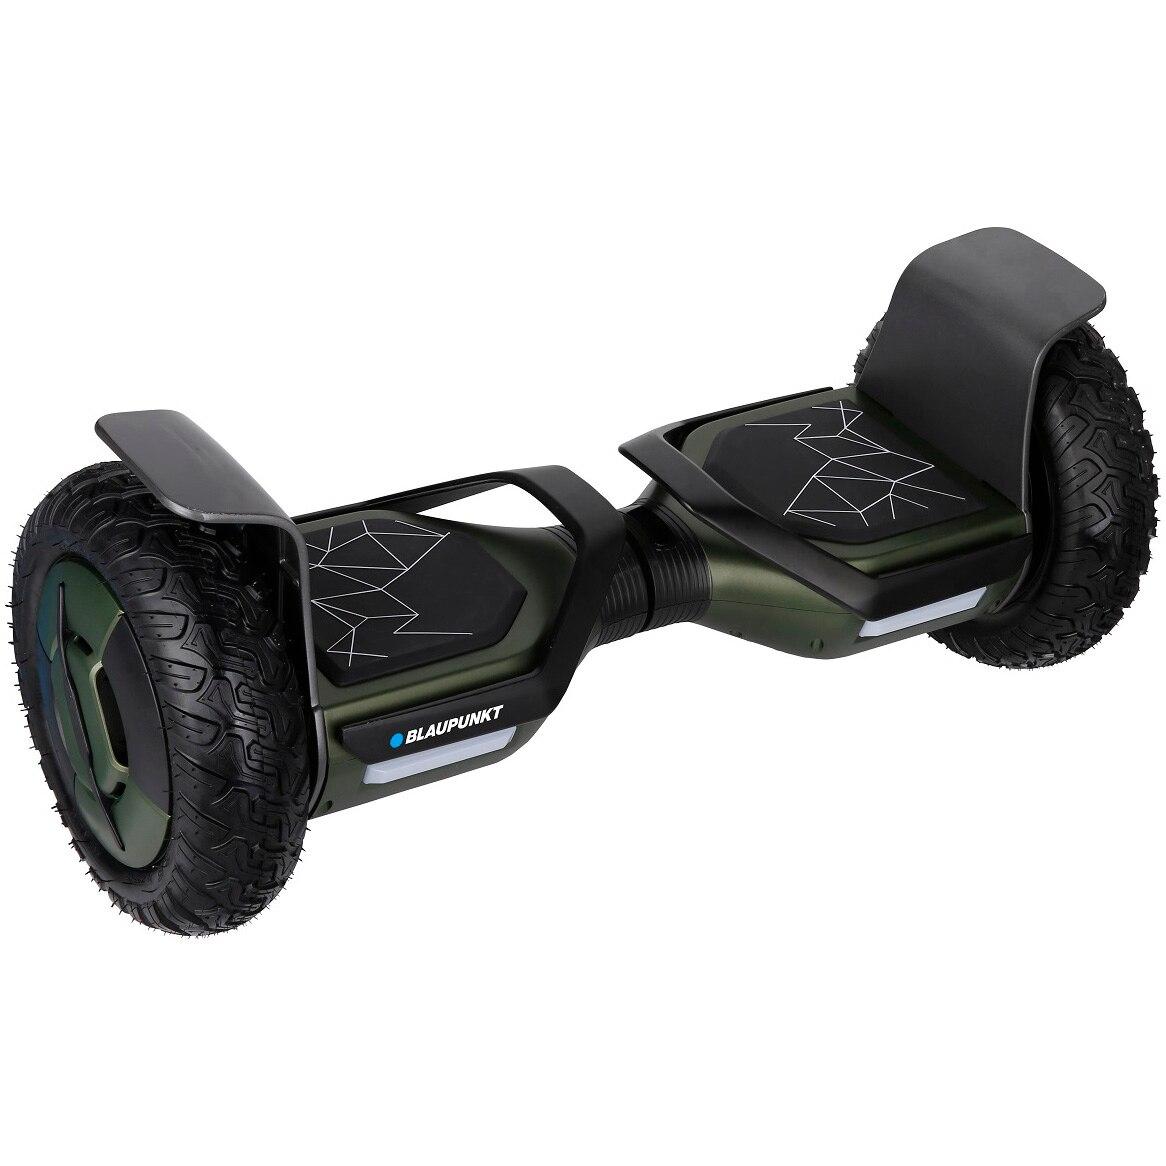 Fotografie Scooter electric Blaupunkt EHB 810, roti 10 inch, motor 700 w, autonomie max. 15 km, Bluetooth, aplicatie Android si IOS